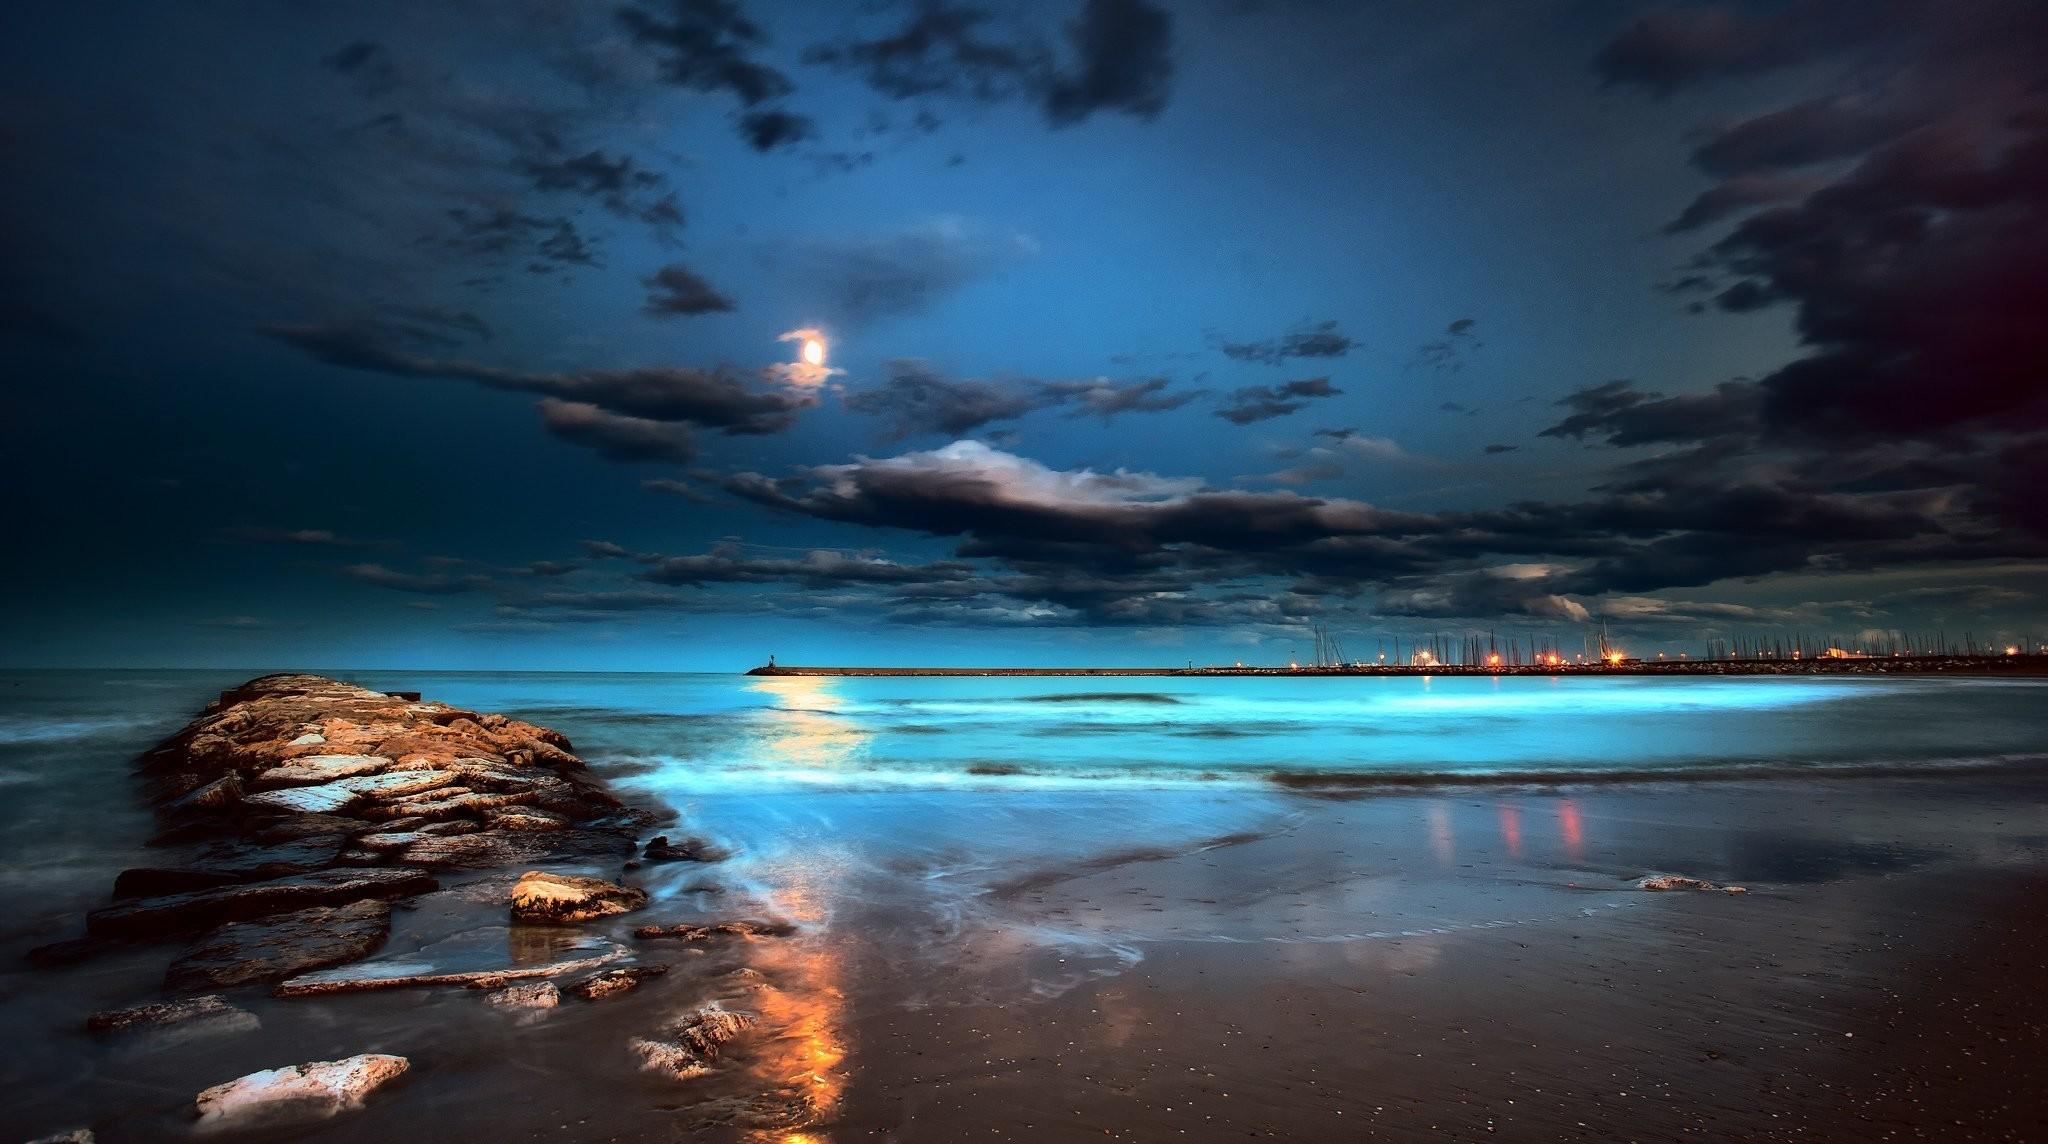 nature night beach moon beach sand HD wallpaper